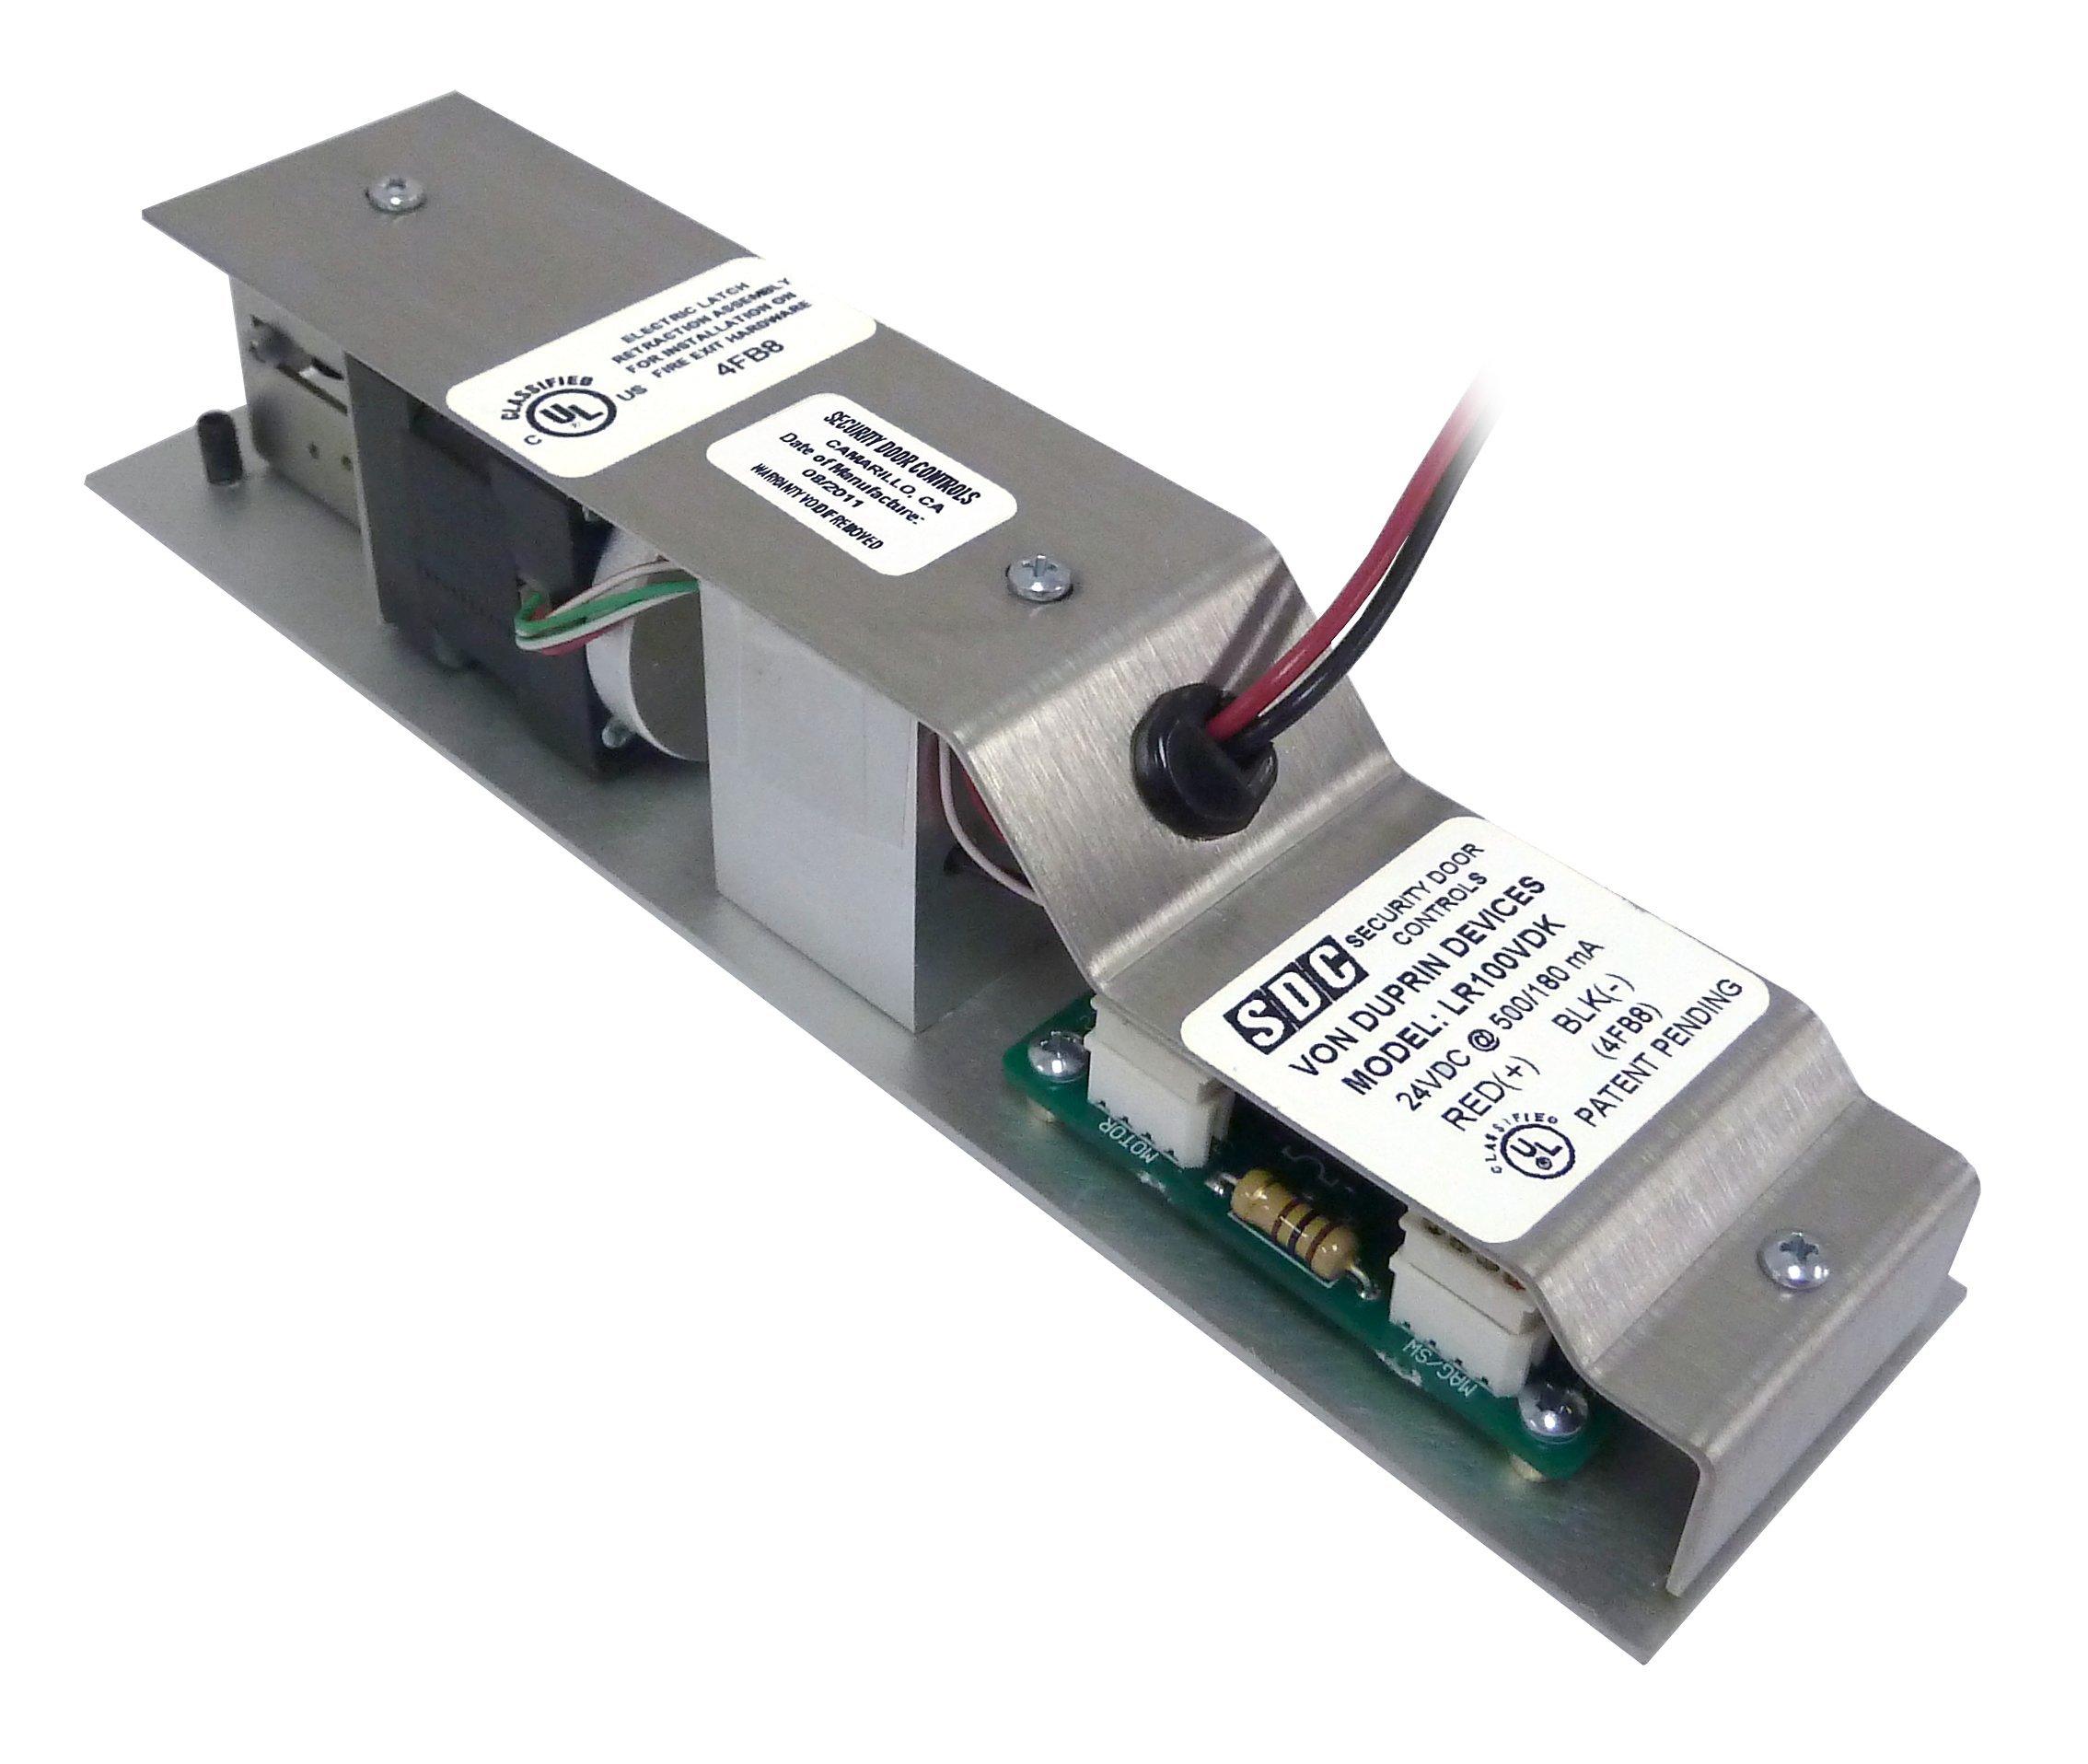 SDC LR100CRK Quiet Duo Dual Latch Retraction-Corbin Russwin Retrofit Kit